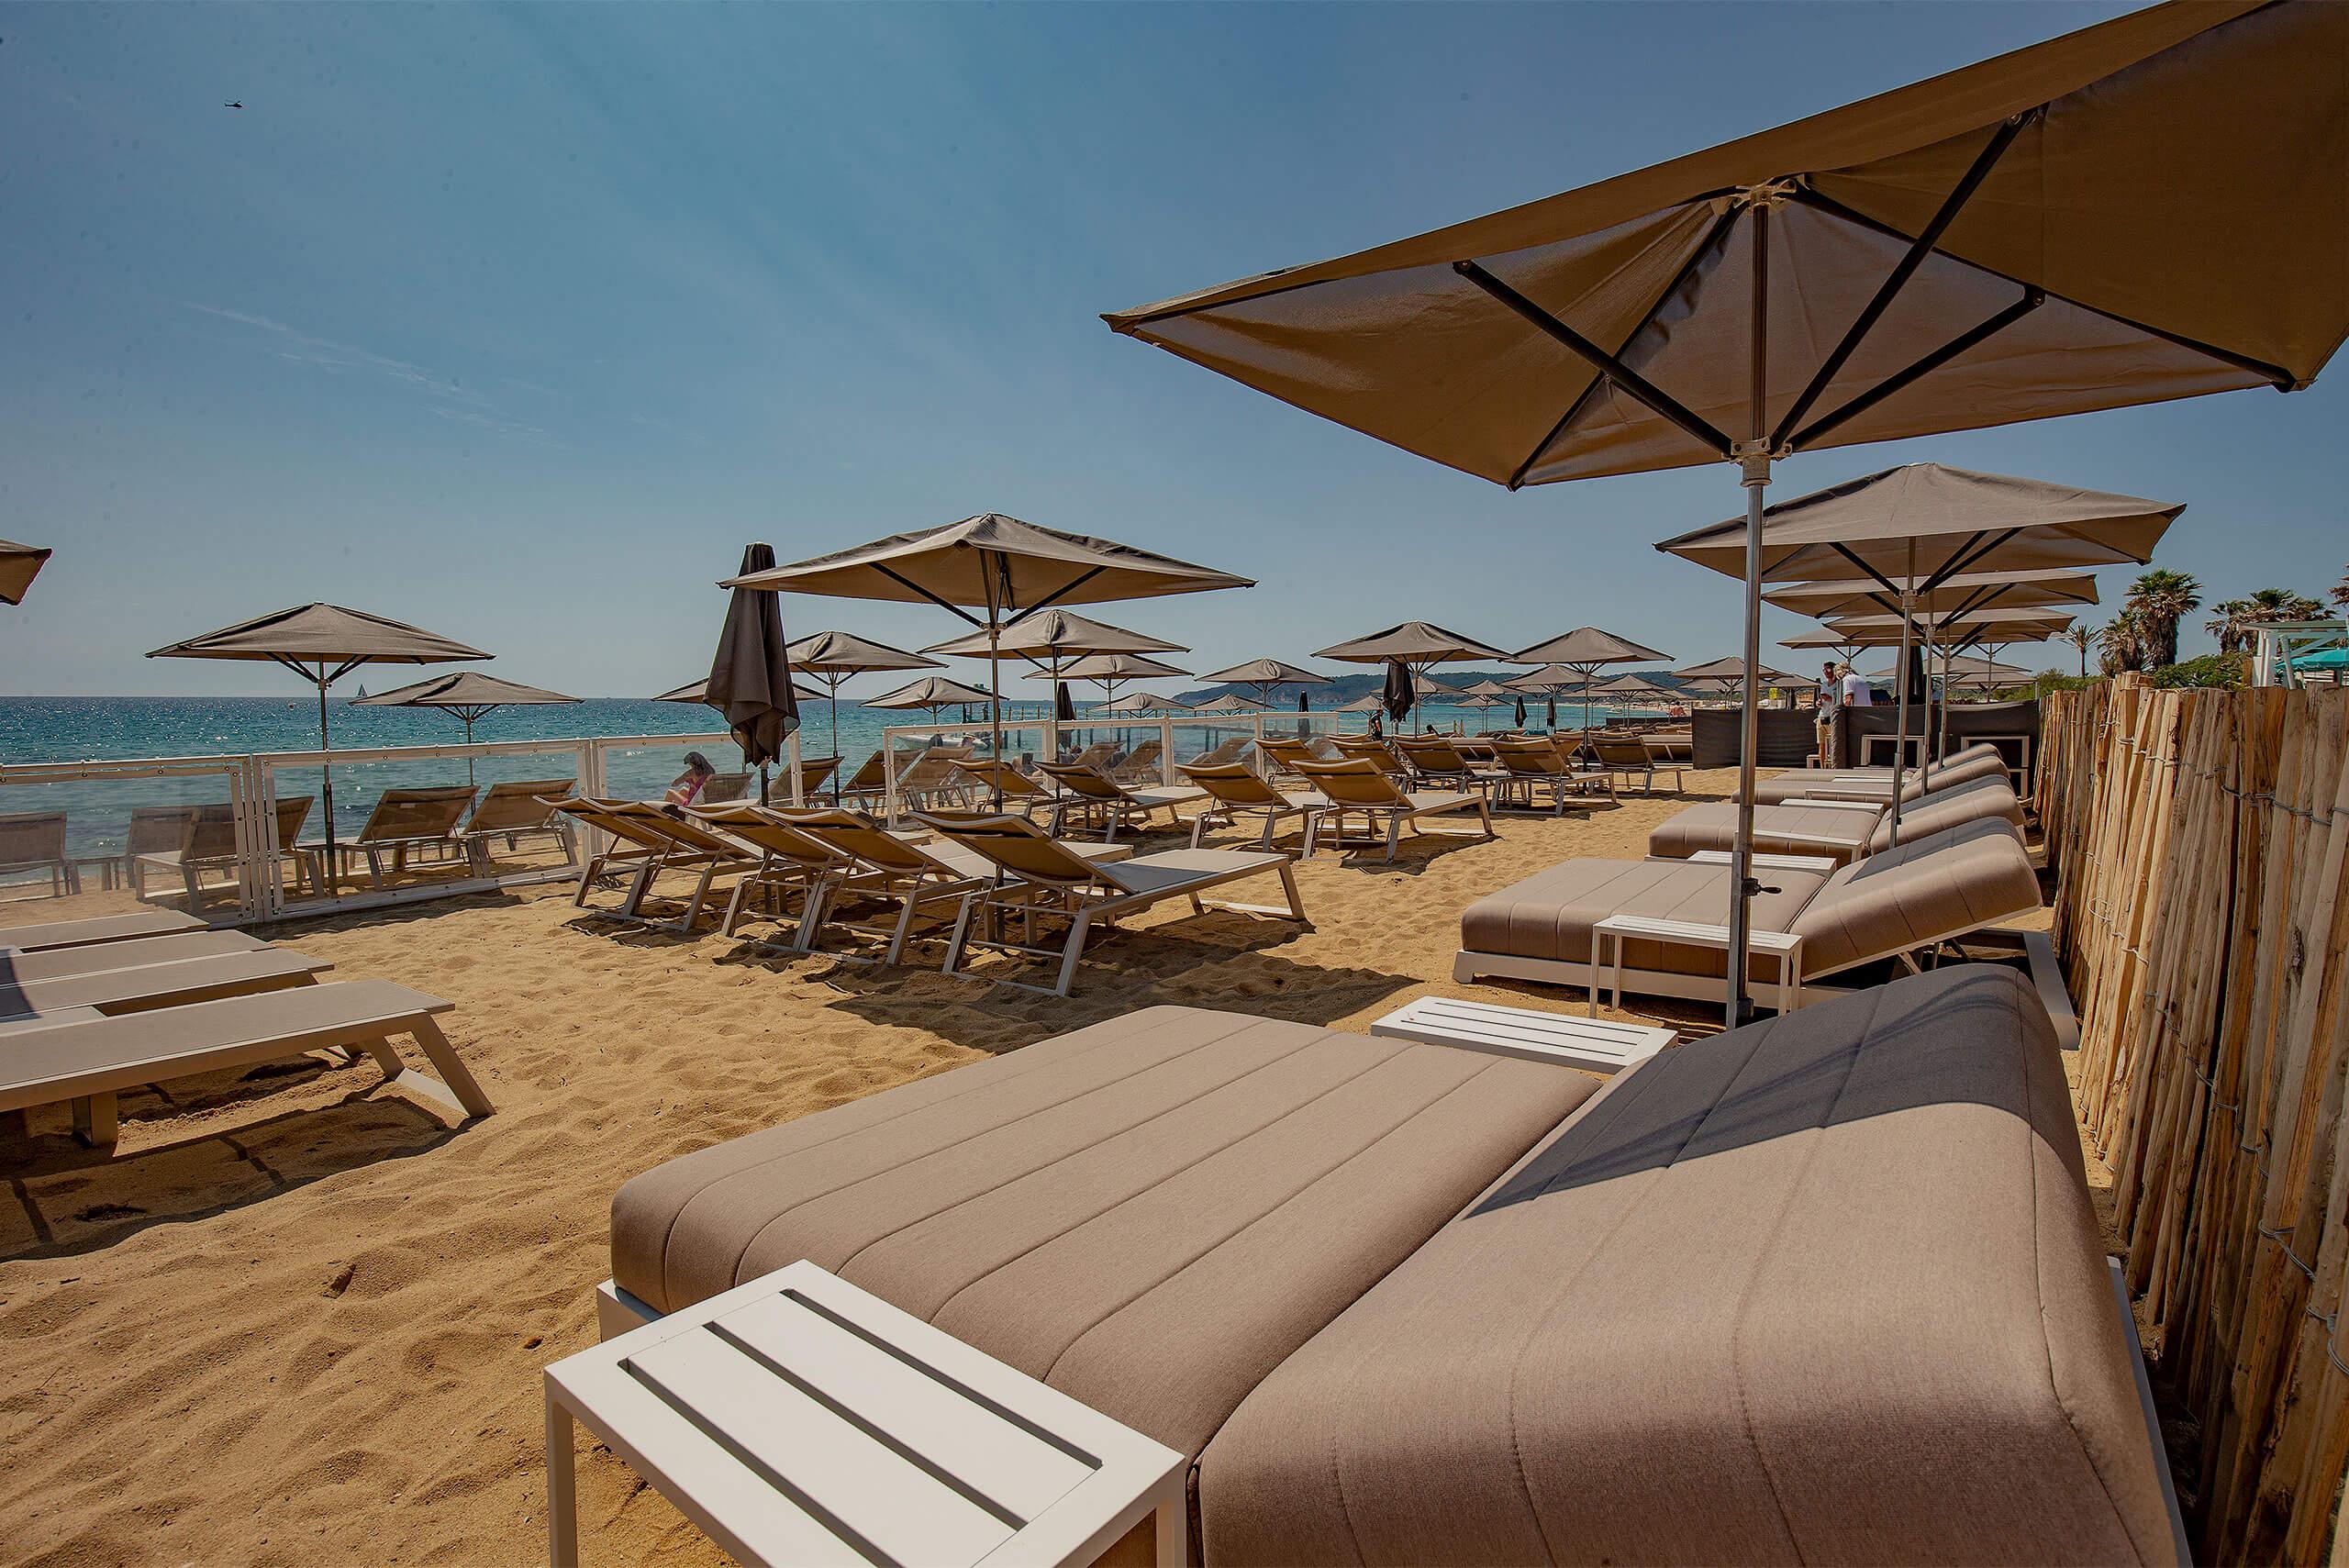 Moorea Beach Plage Pampelonne Ramatuelle